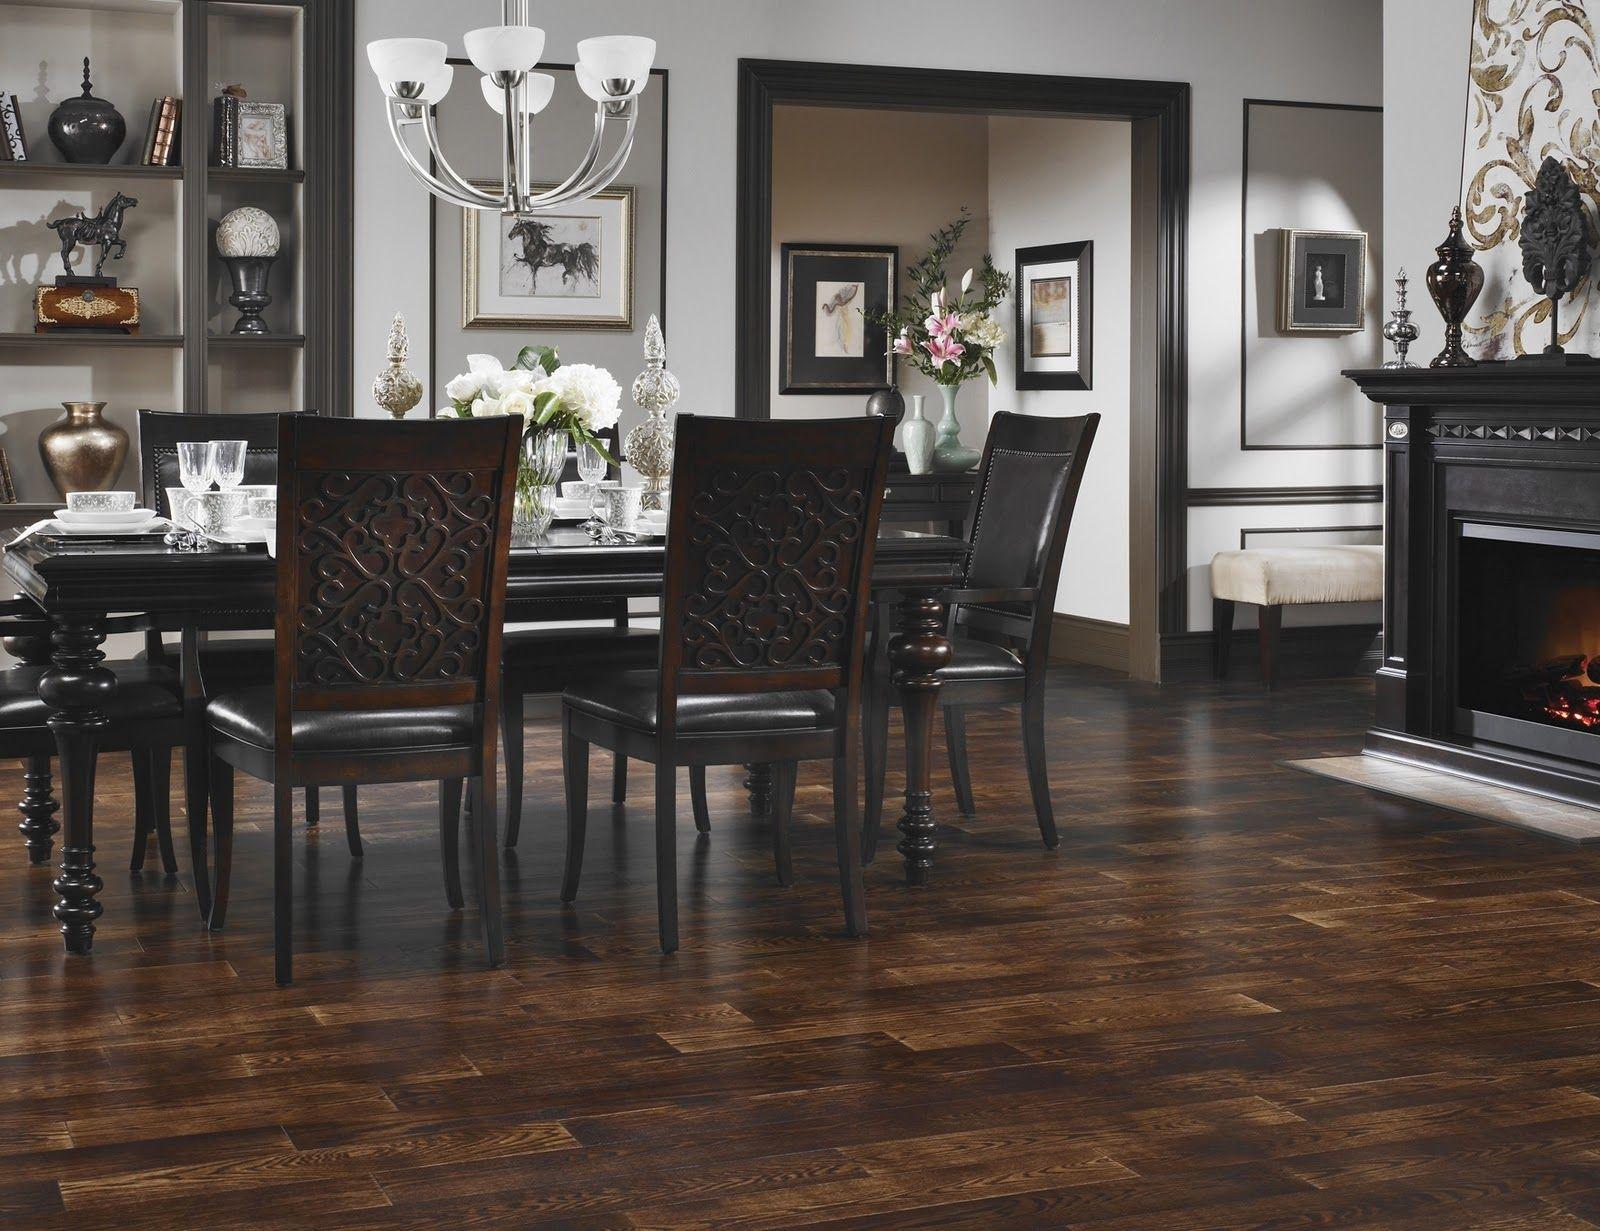 Classic Chic Home Living with Dark Hardwood Floors